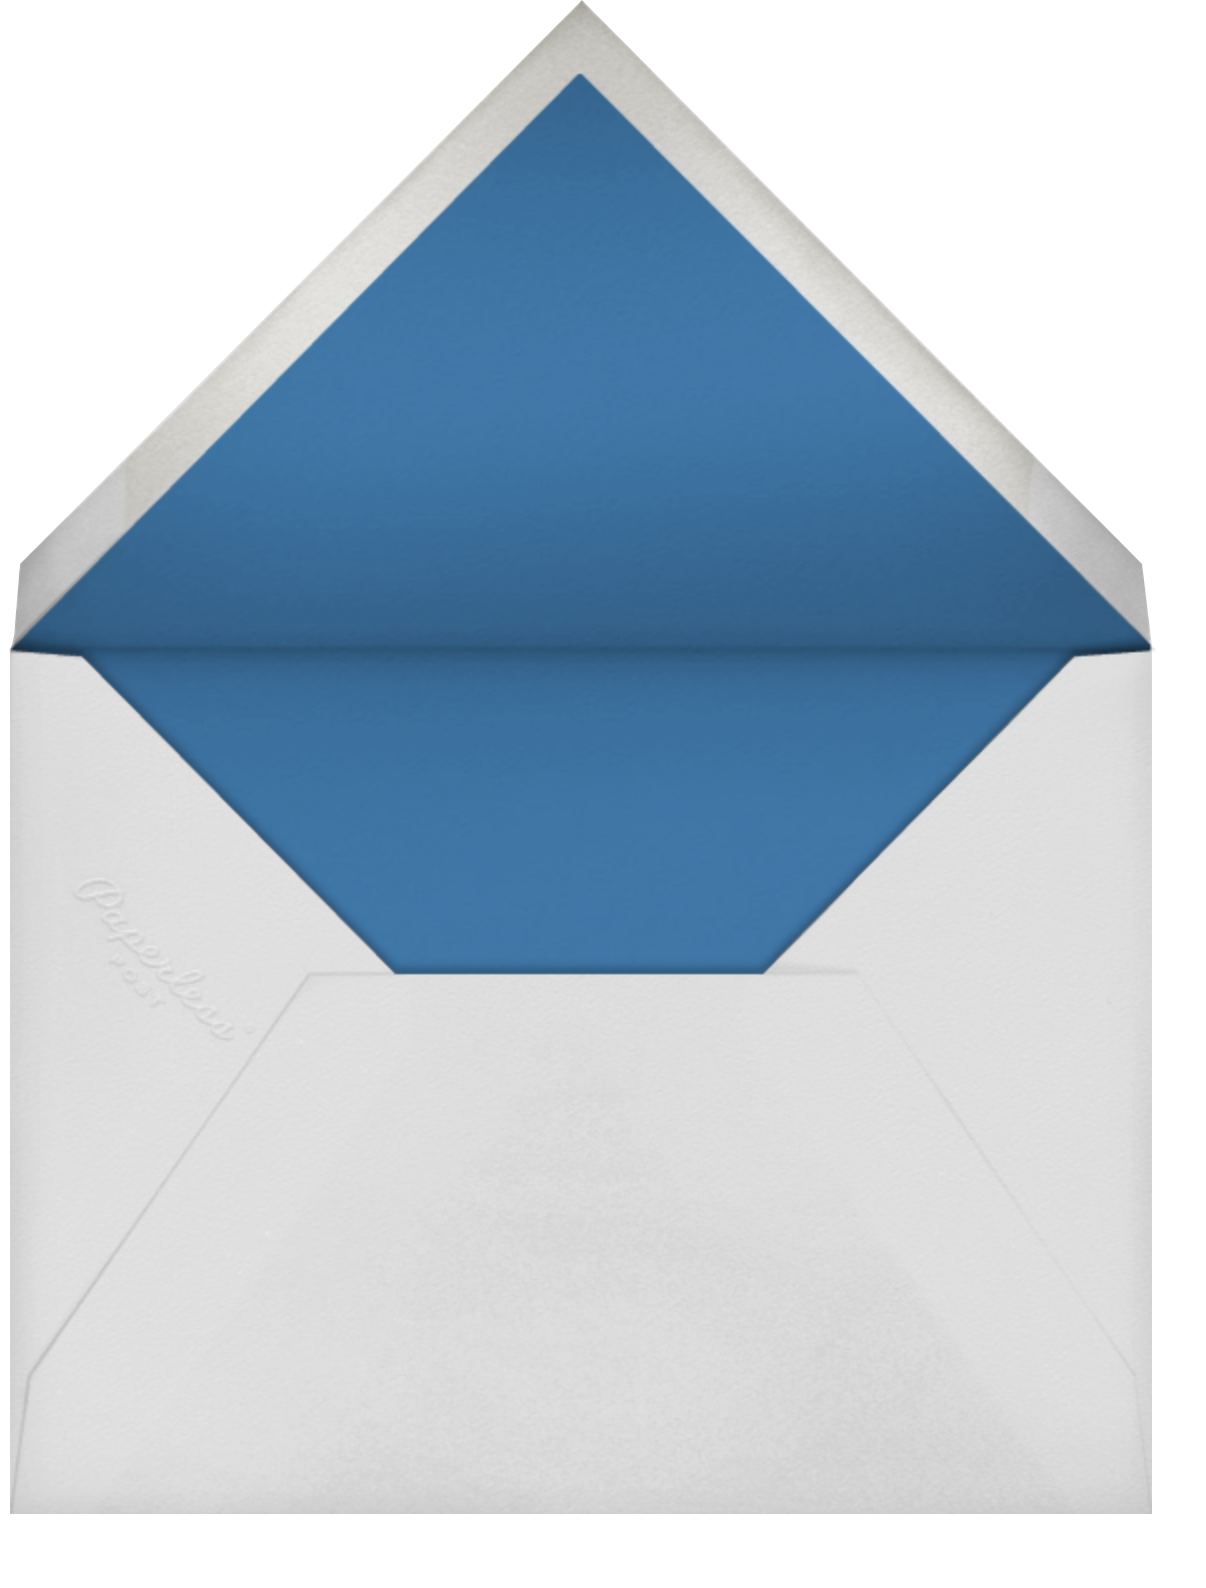 Gold Menorah - Antwerp - Paperless Post - Hanukkah - envelope back